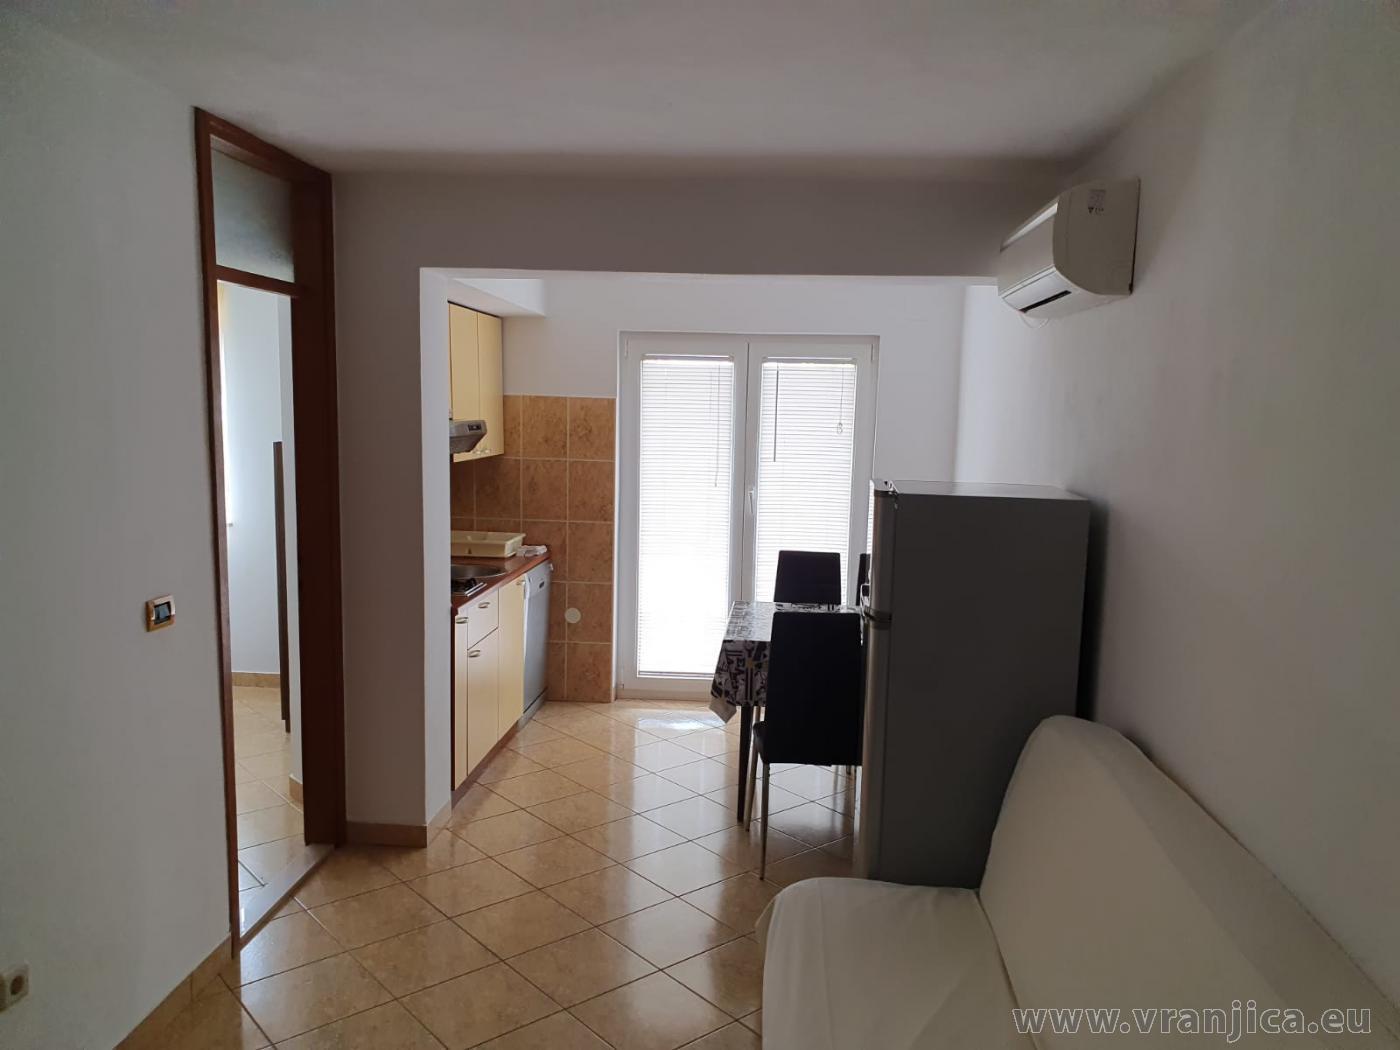 https://www.vranjica.eu/pokoje/apartman-radacic-ap1-4-1-1597763453L.jpg